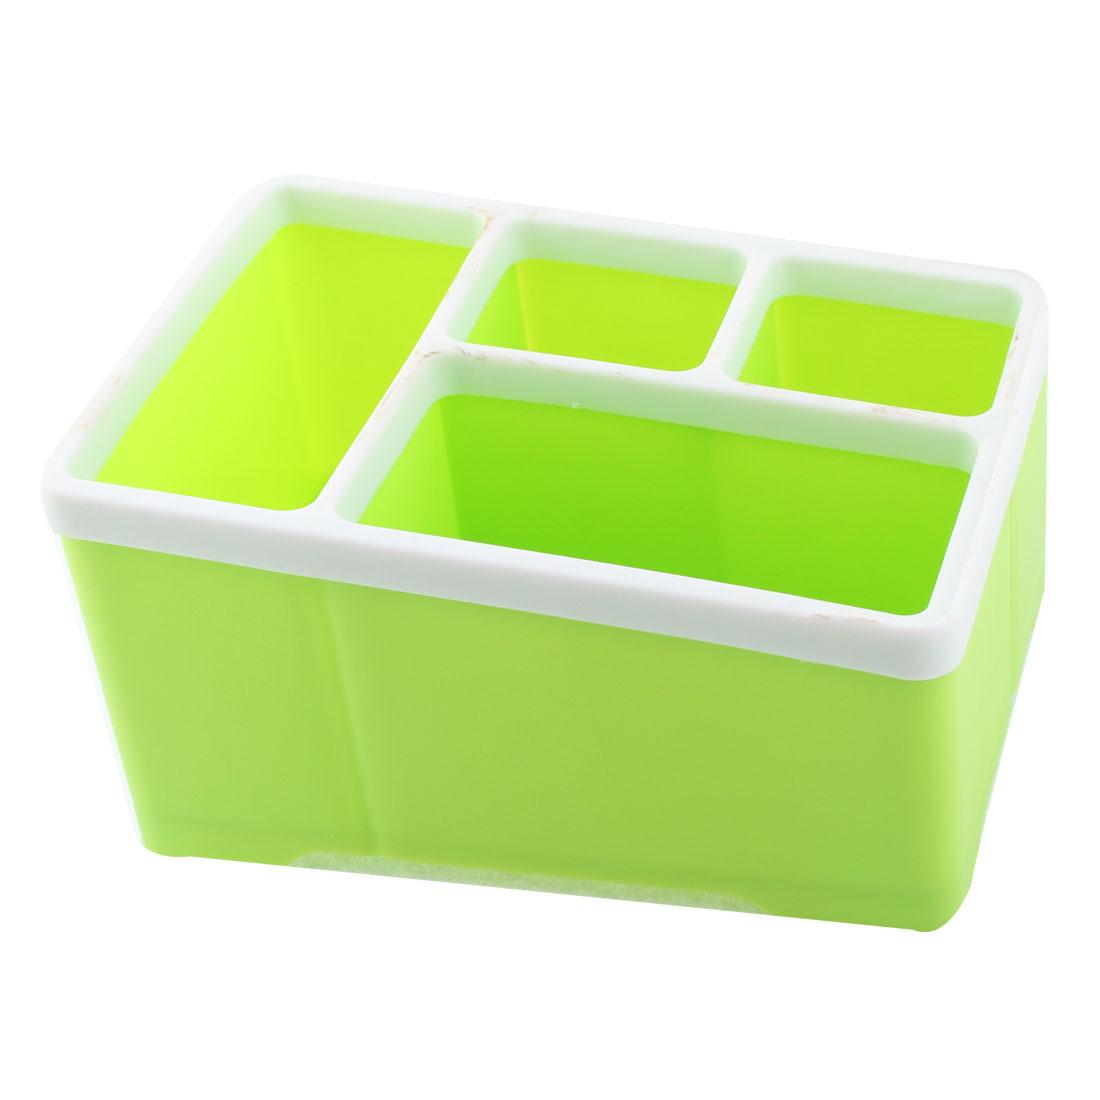 Plastic 4 Compartments Remote Control Sundries Storage Organizer Holder Box